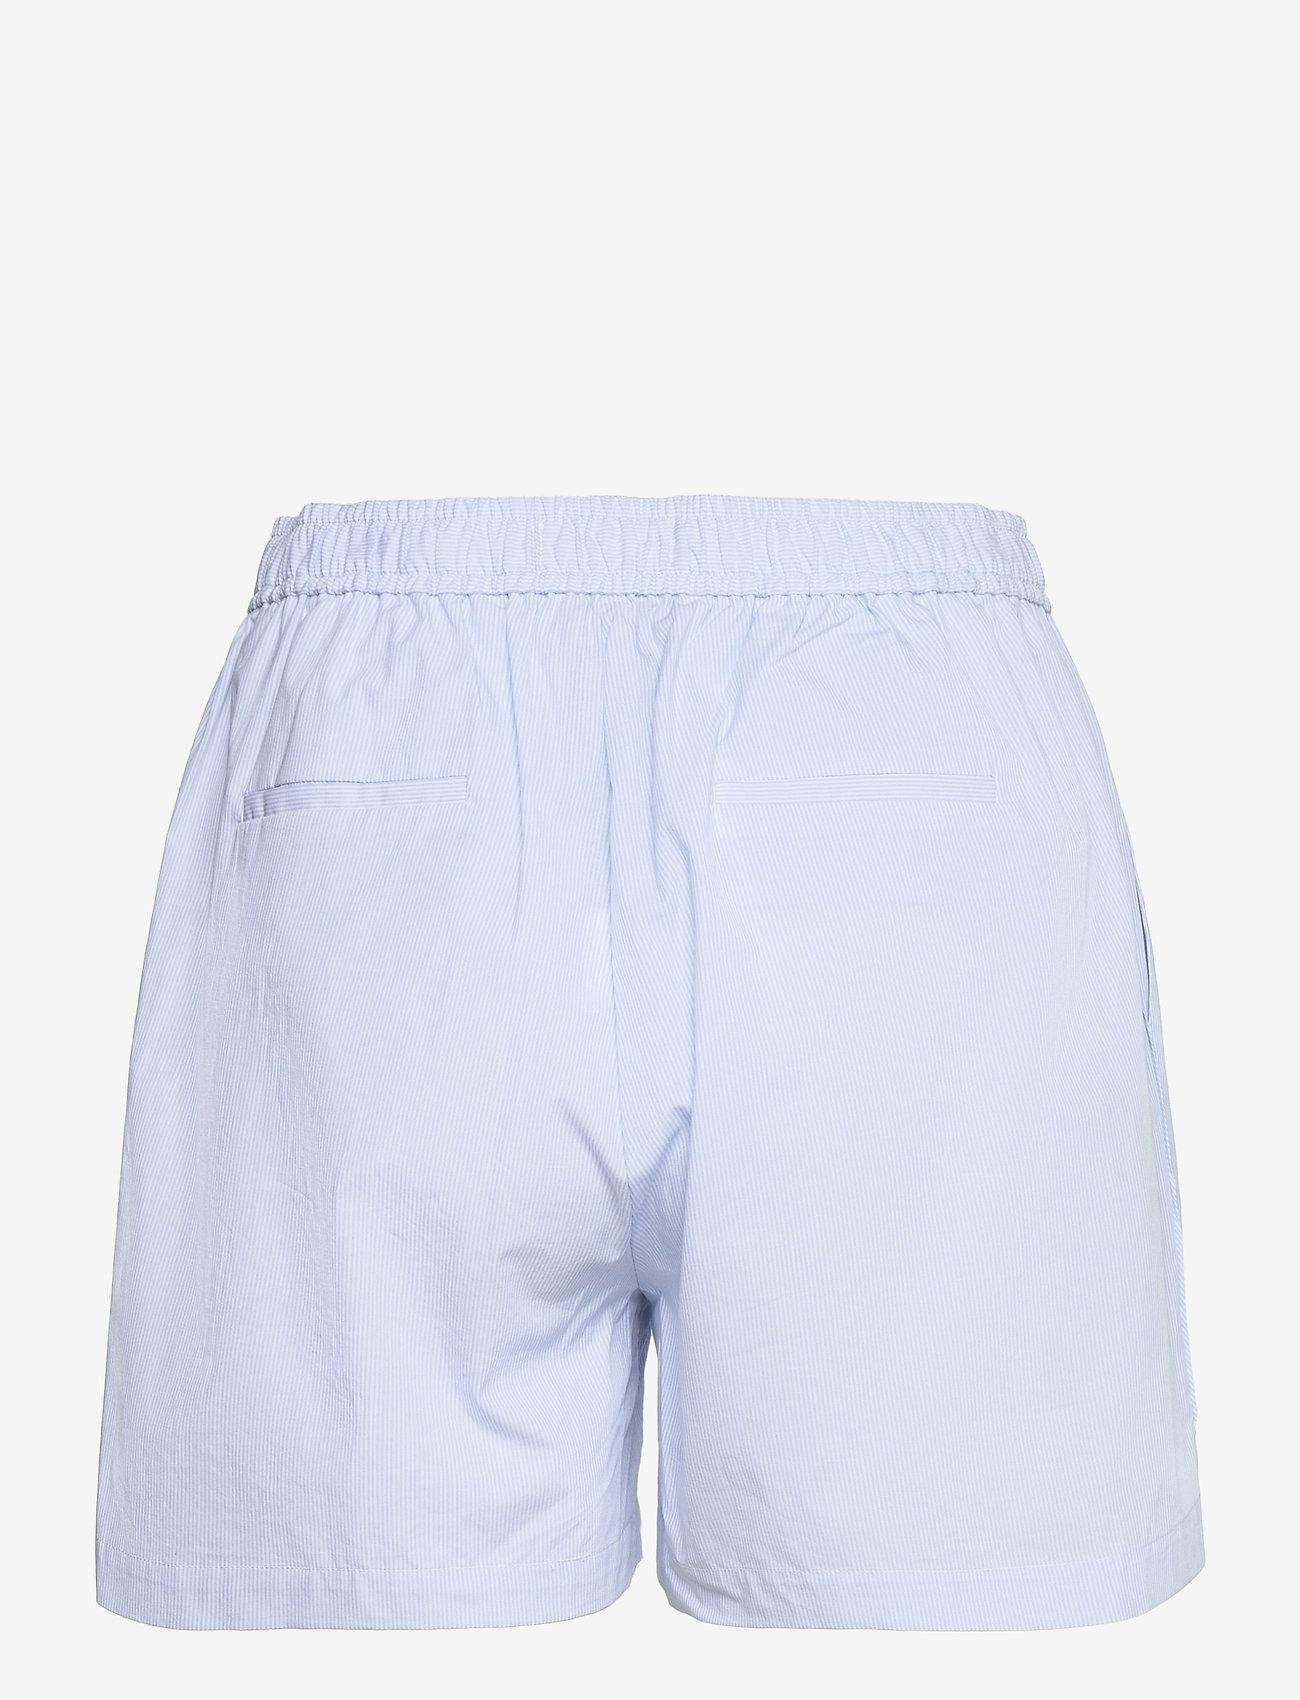 Levete Room - LR-NANNA - shorts casual - l233c - celestial blue combi - 1